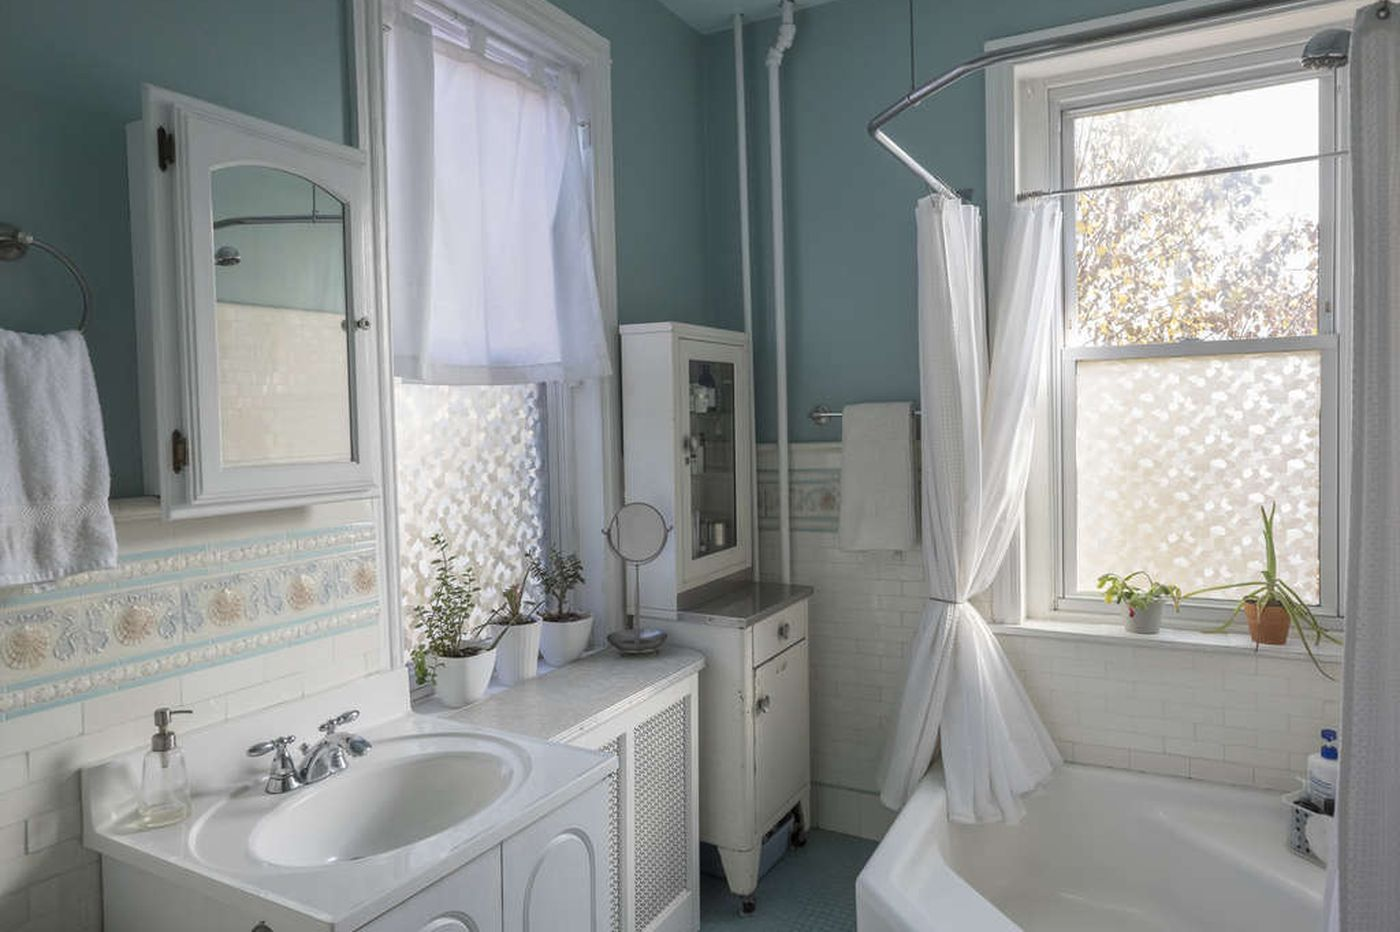 Ask Jennifer Adams: How long should that bathroom tile last?